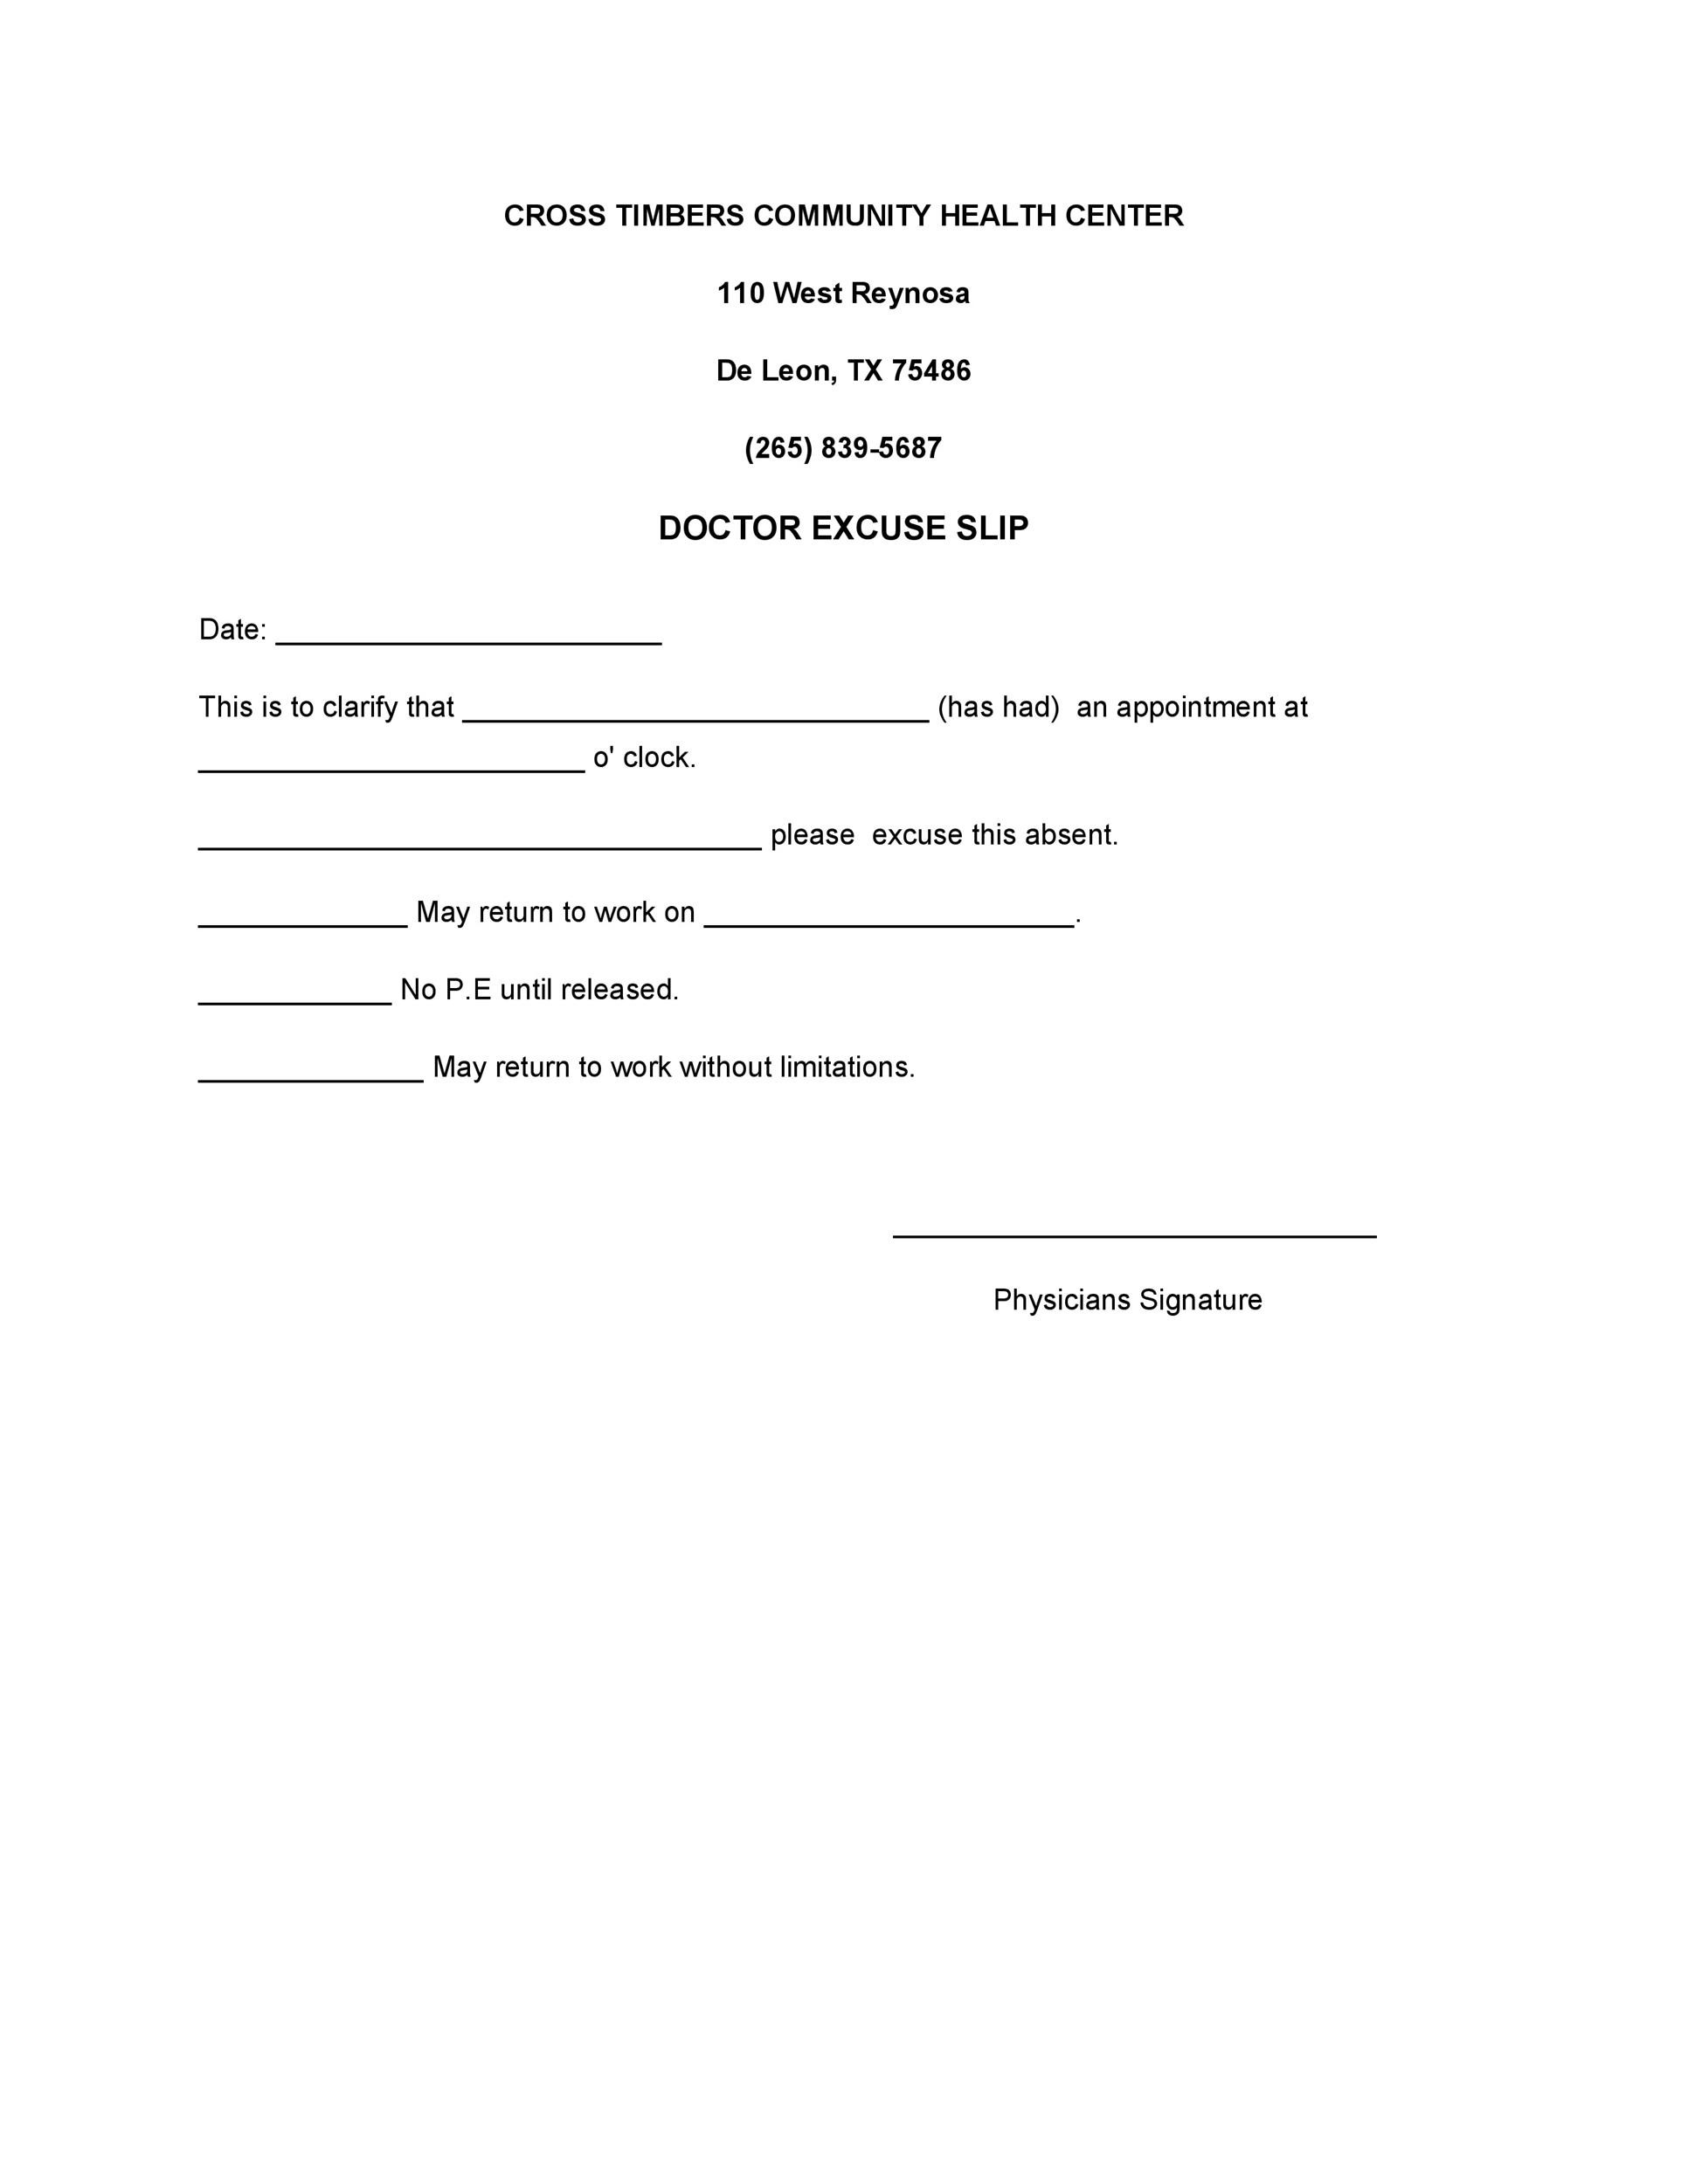 Kaiser Permanente Urgent Care Note